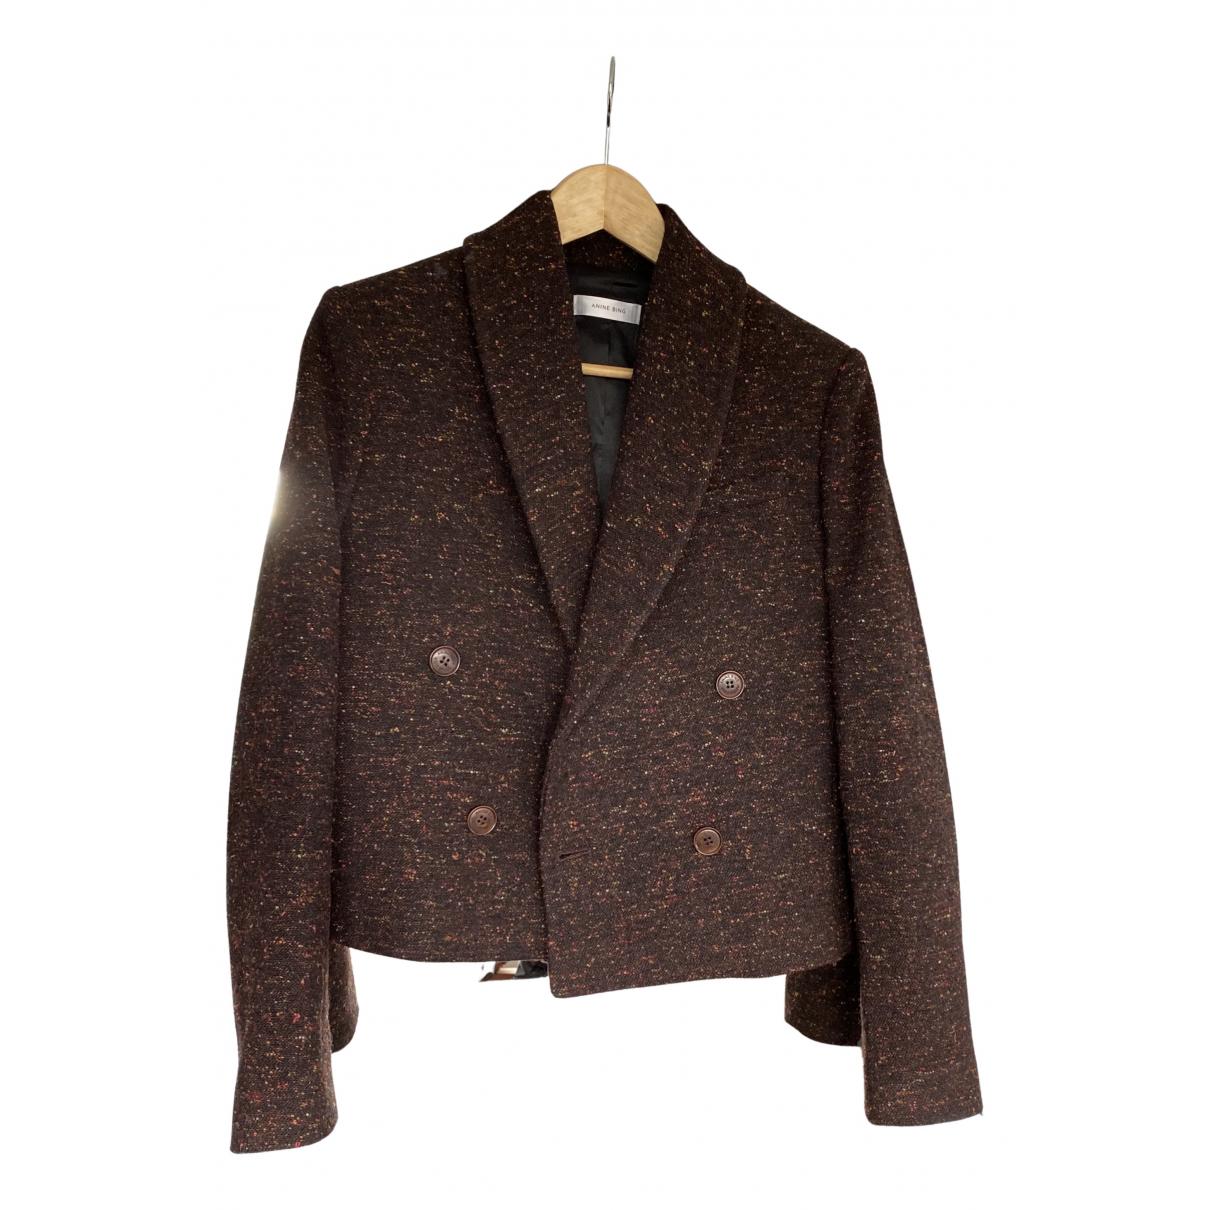 Anine Bing Spring Summer 2020 wool blazer